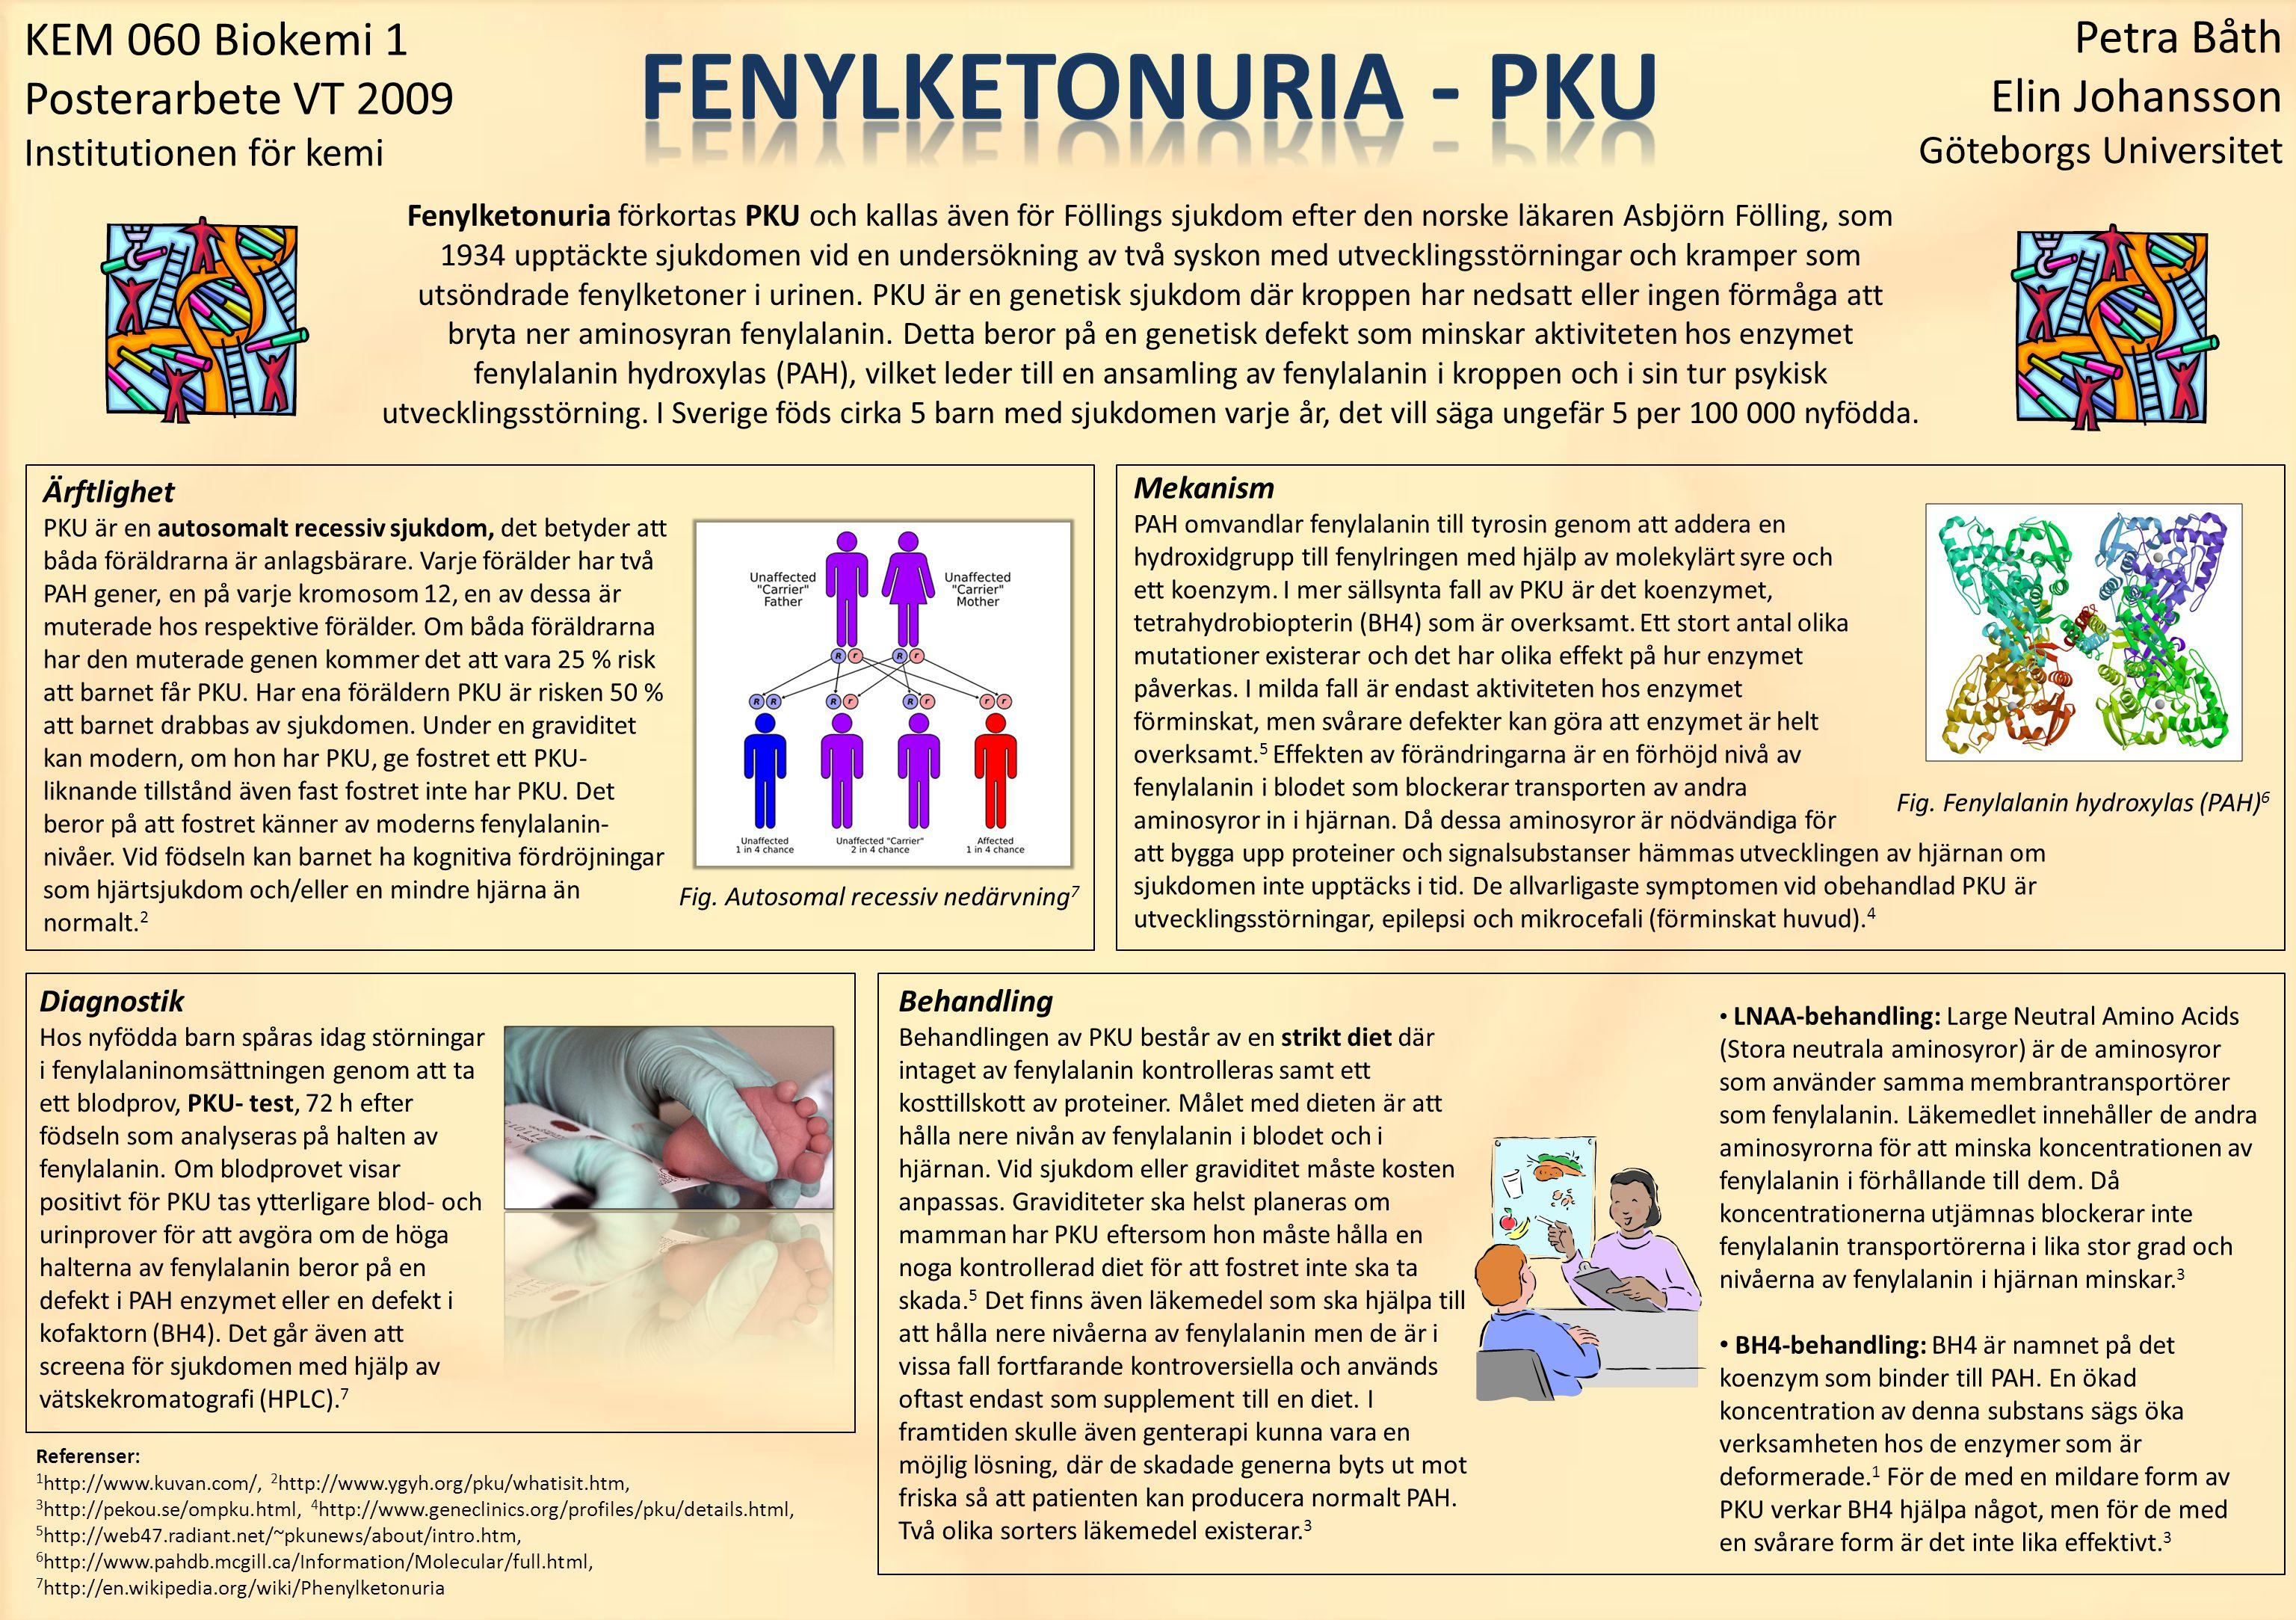 FENYLKETONURIA - PKU Petra Båth KEM 060 Biokemi 1 Elin Johansson